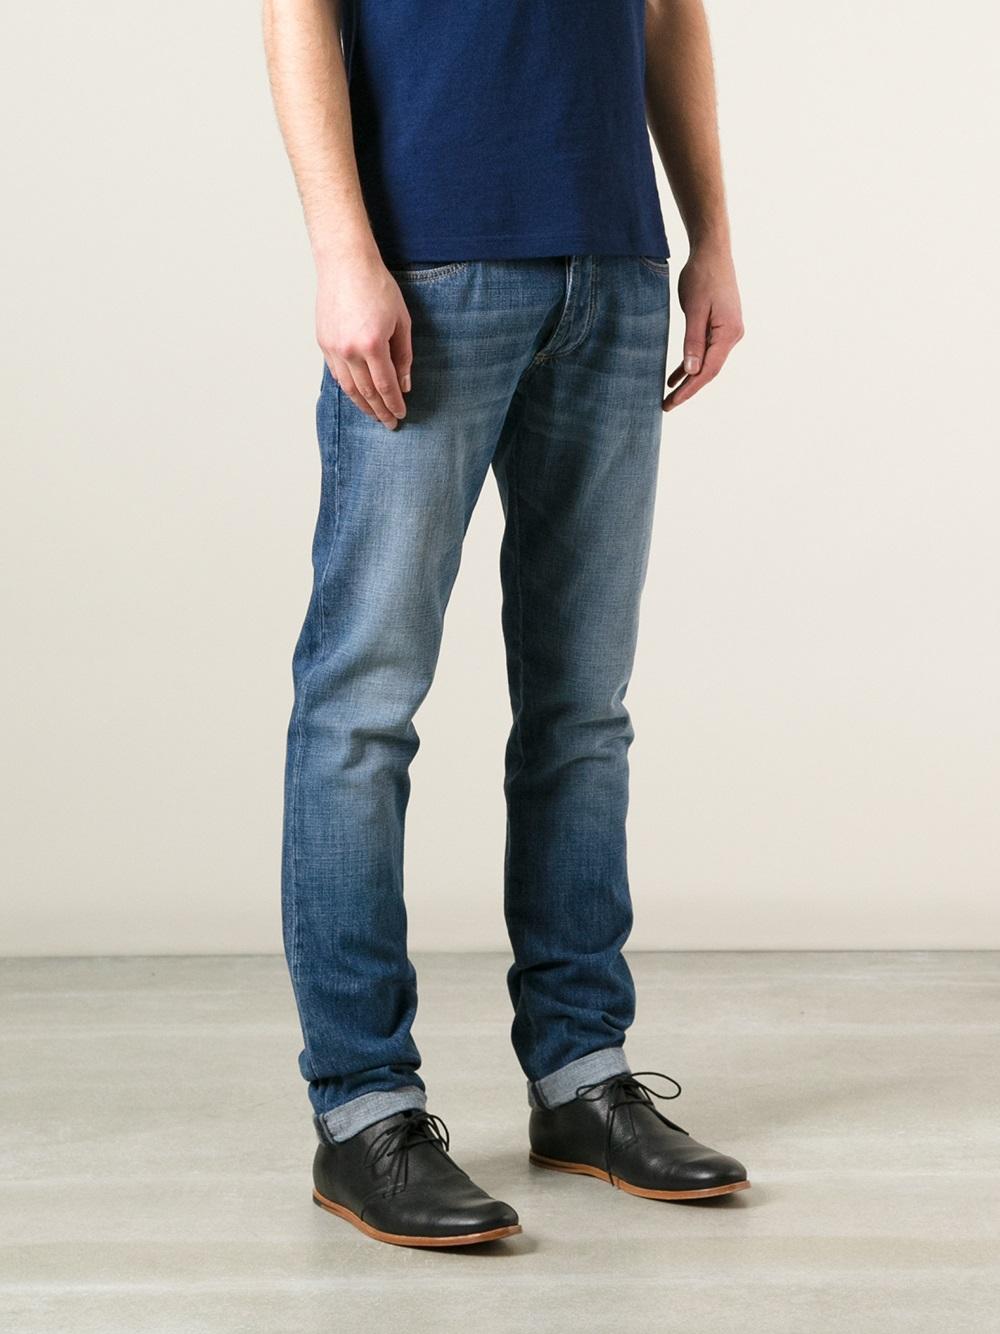 Lyst Brunello Cucinelli Slim Fit Faded Jean In Blue For Men